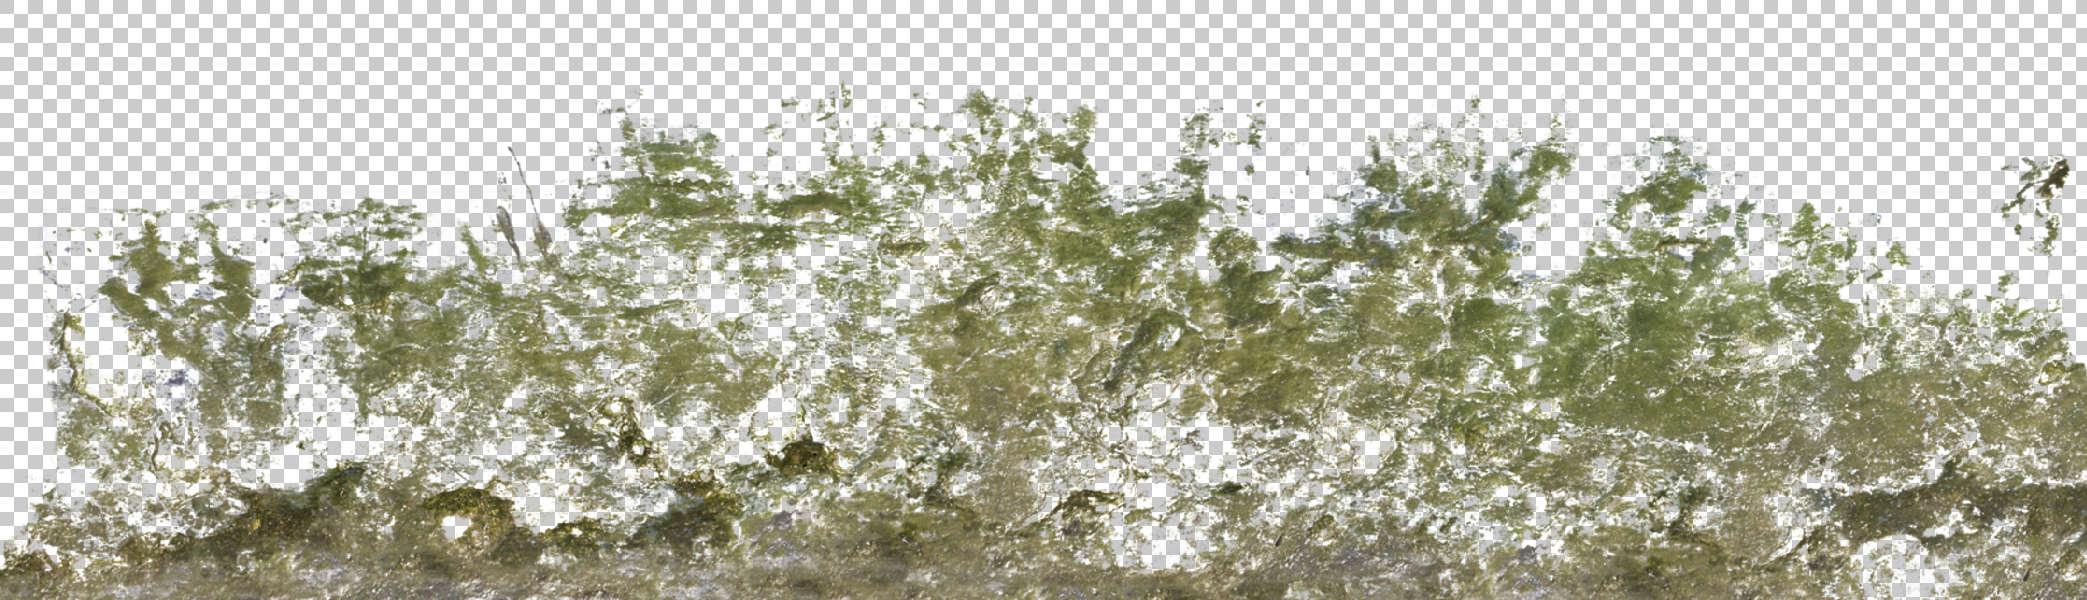 Decalbottom0023 Free Background Texture Stain Mossy